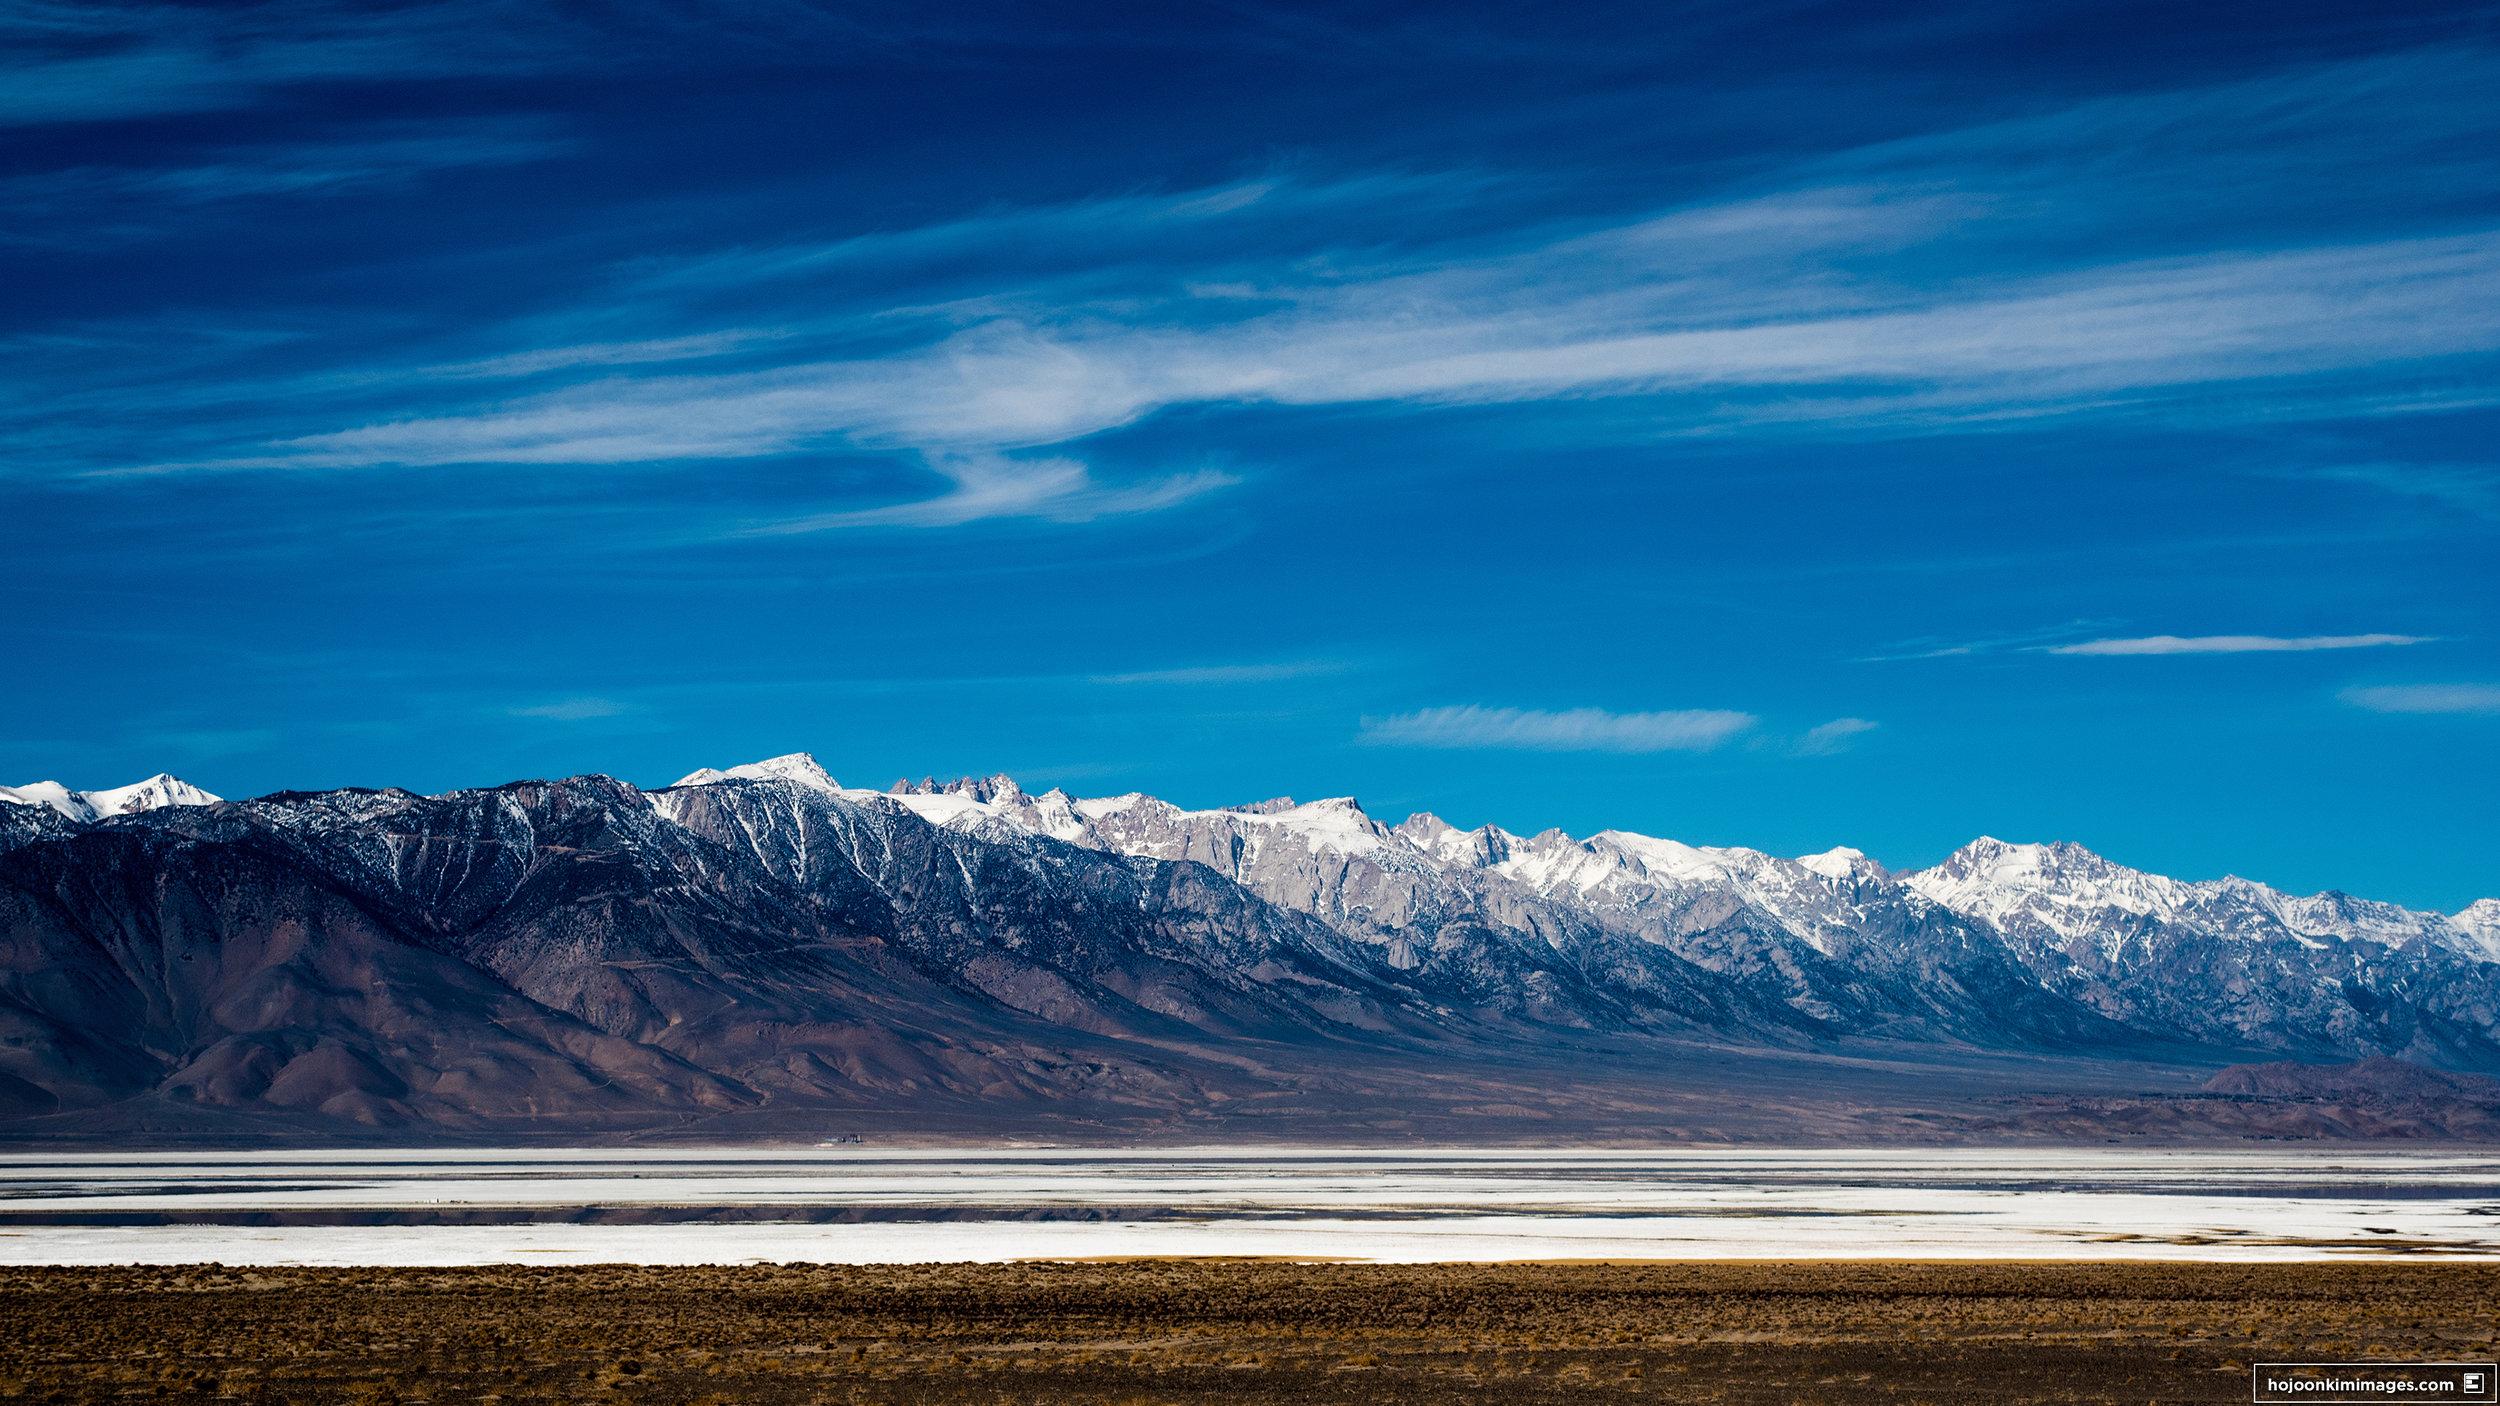 Eastern Sierras - 4K.jpg